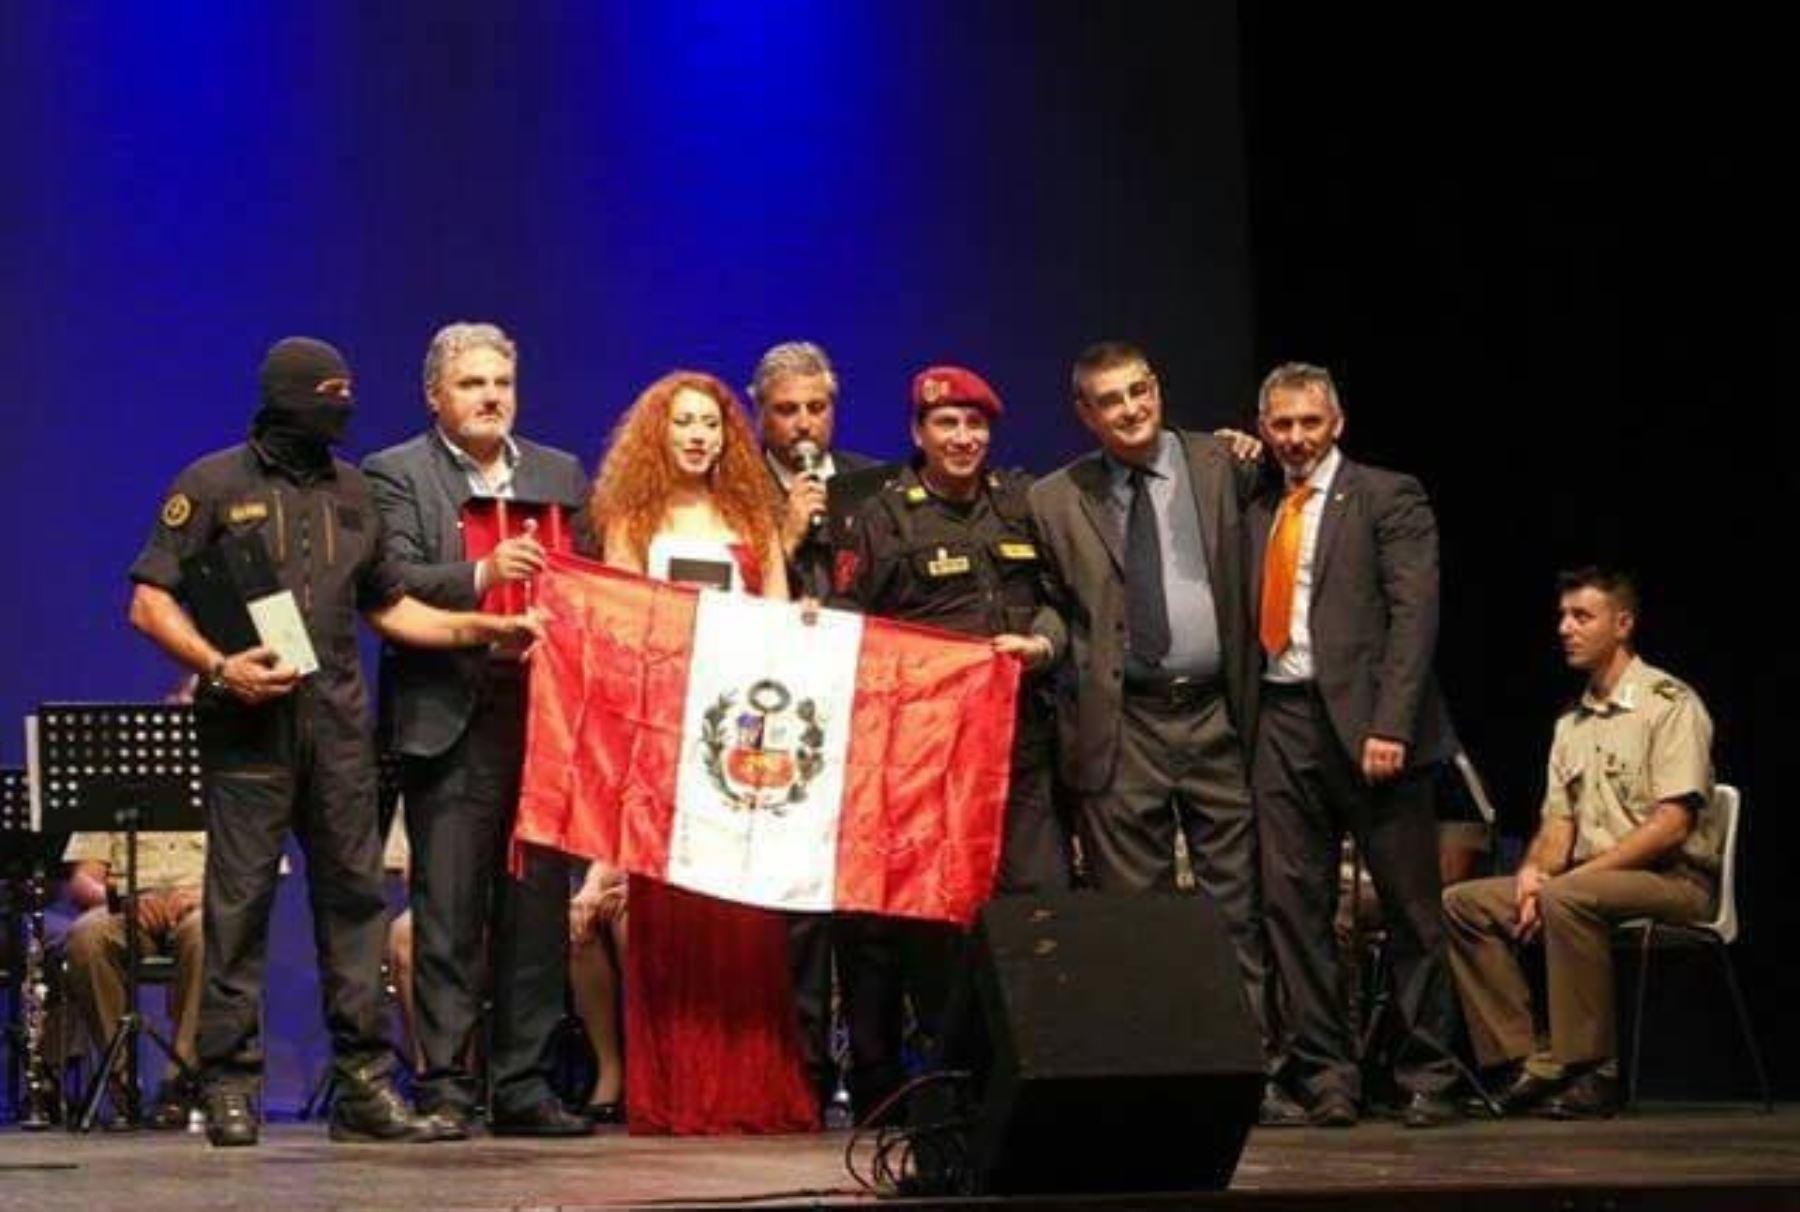 Película de policía payaso se estrena este jueves 27 en Lima.